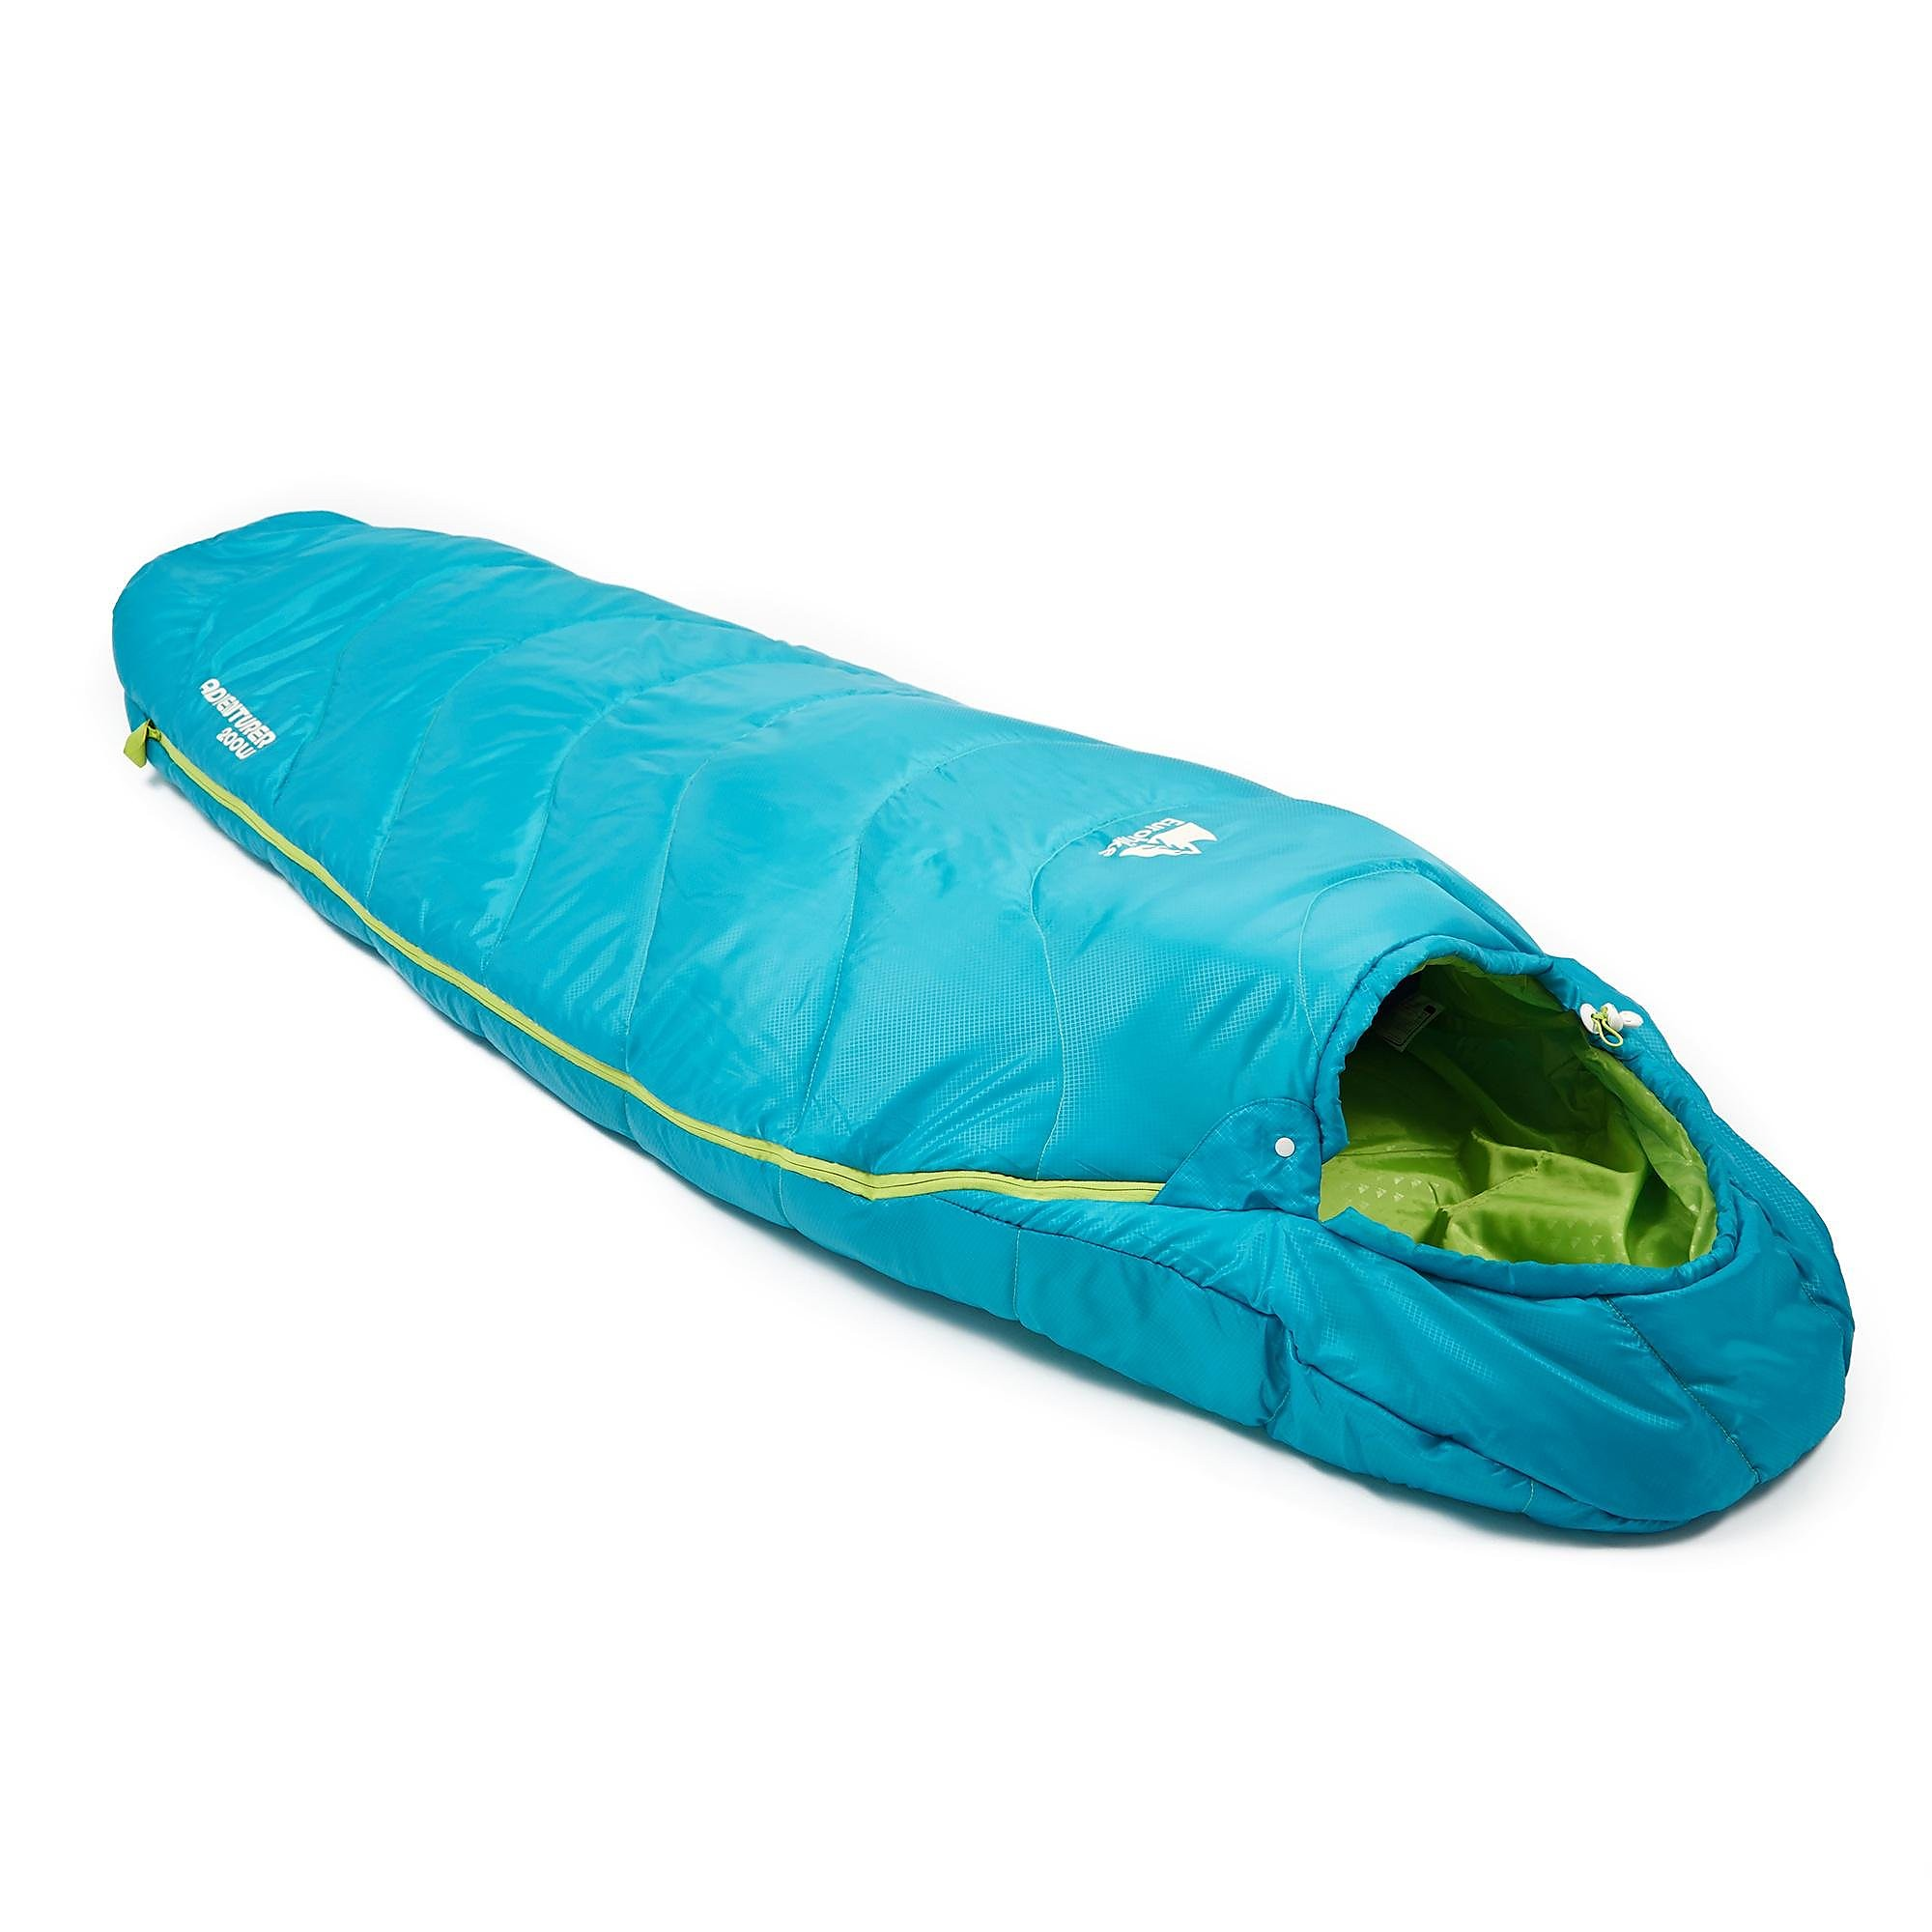 Eurohike Women's Adventurer 200 Sleeping Bag